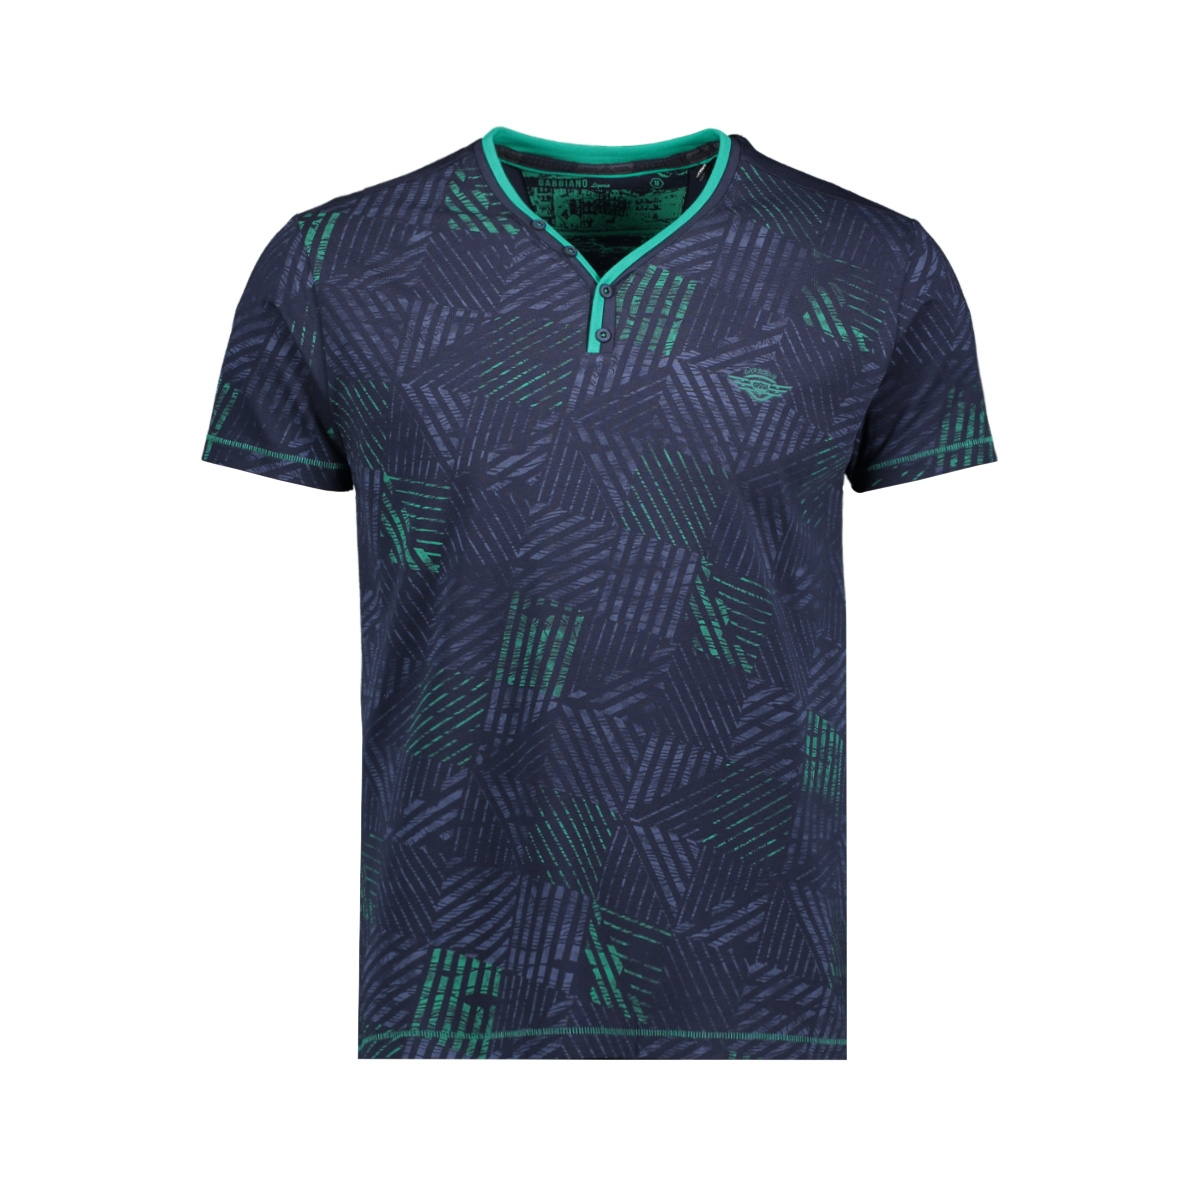 t shirt 15201 gabbiano t-shirt navy